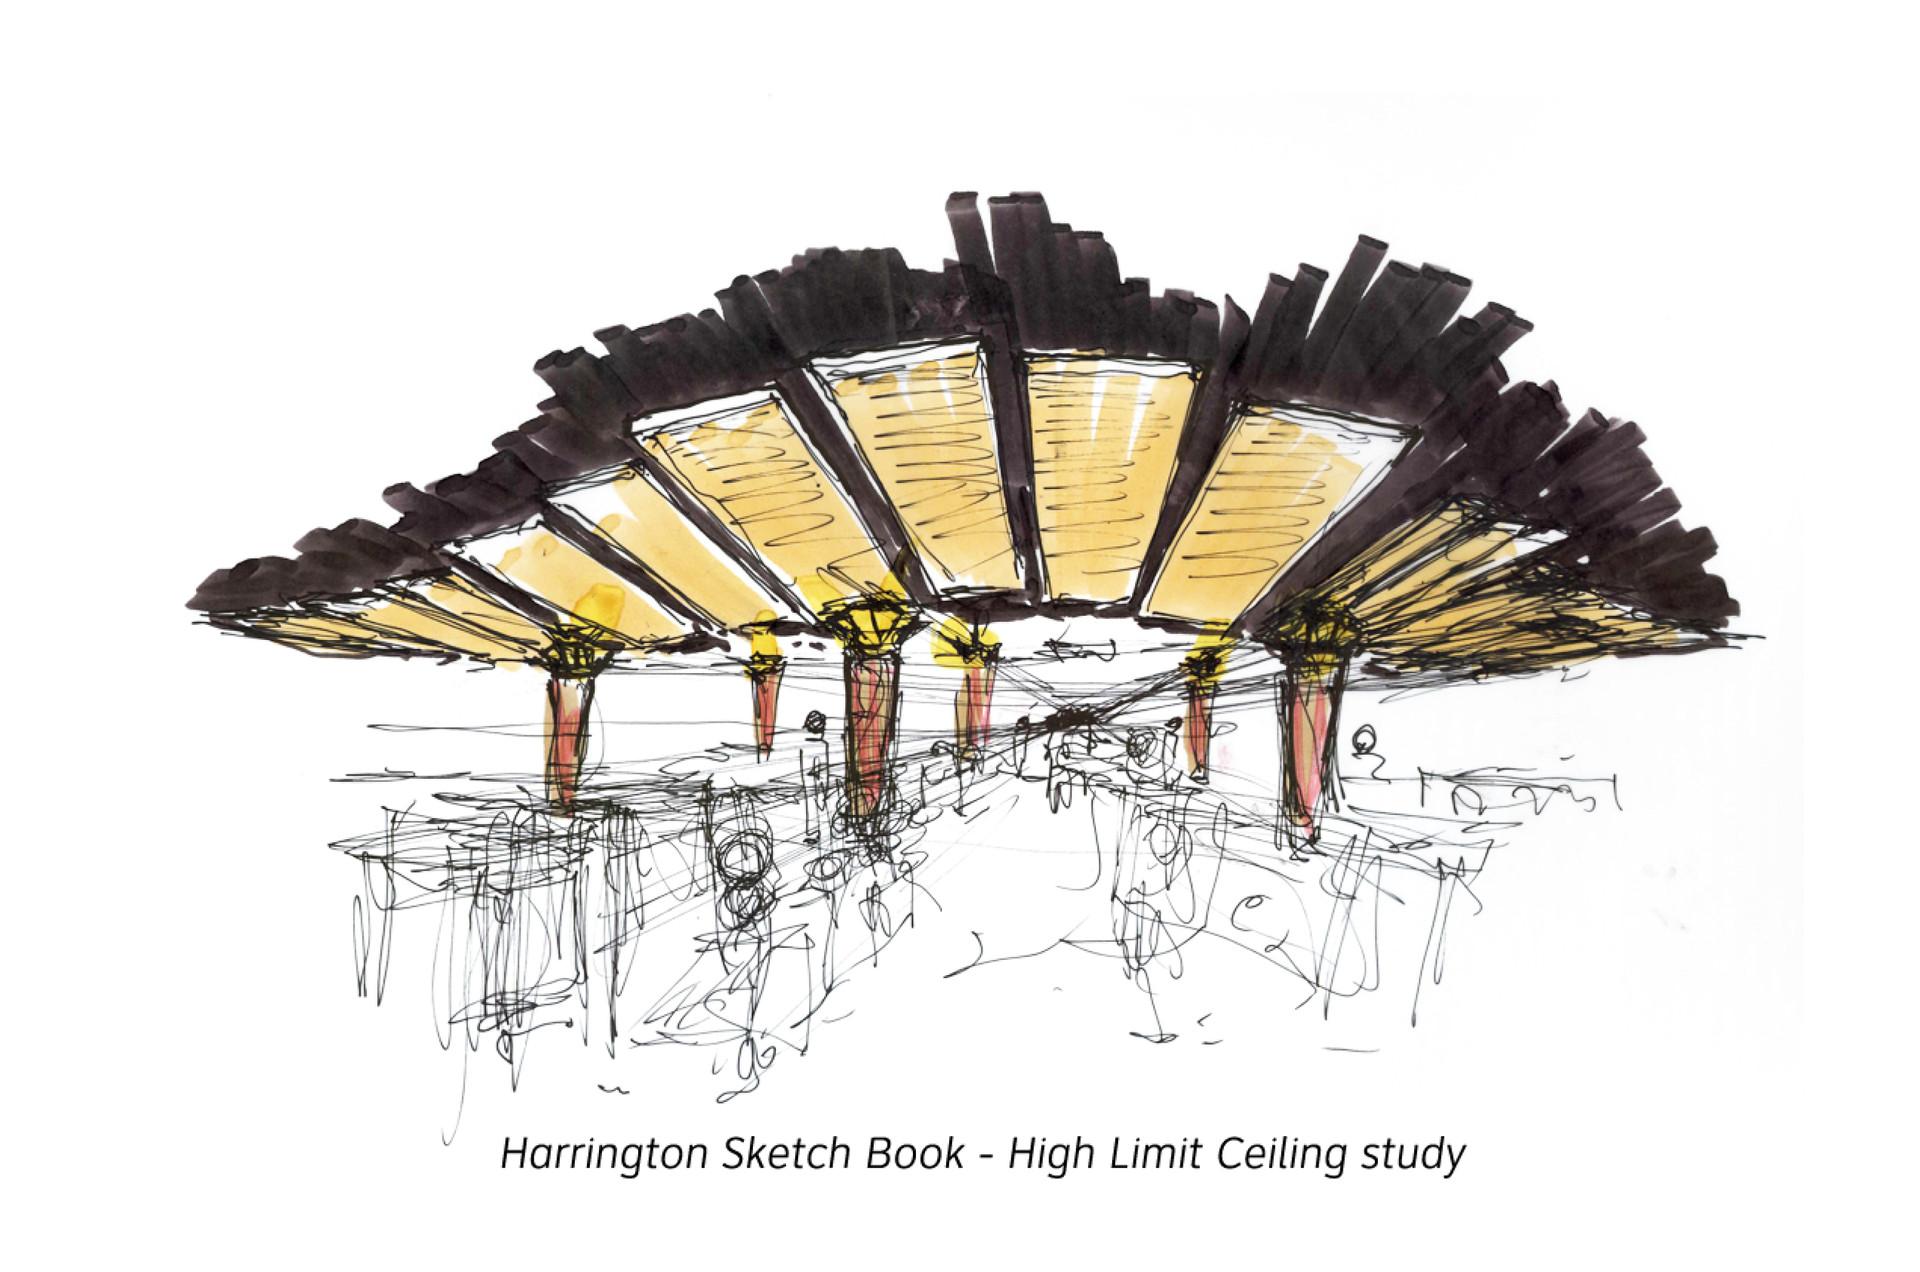 Ceiling Study